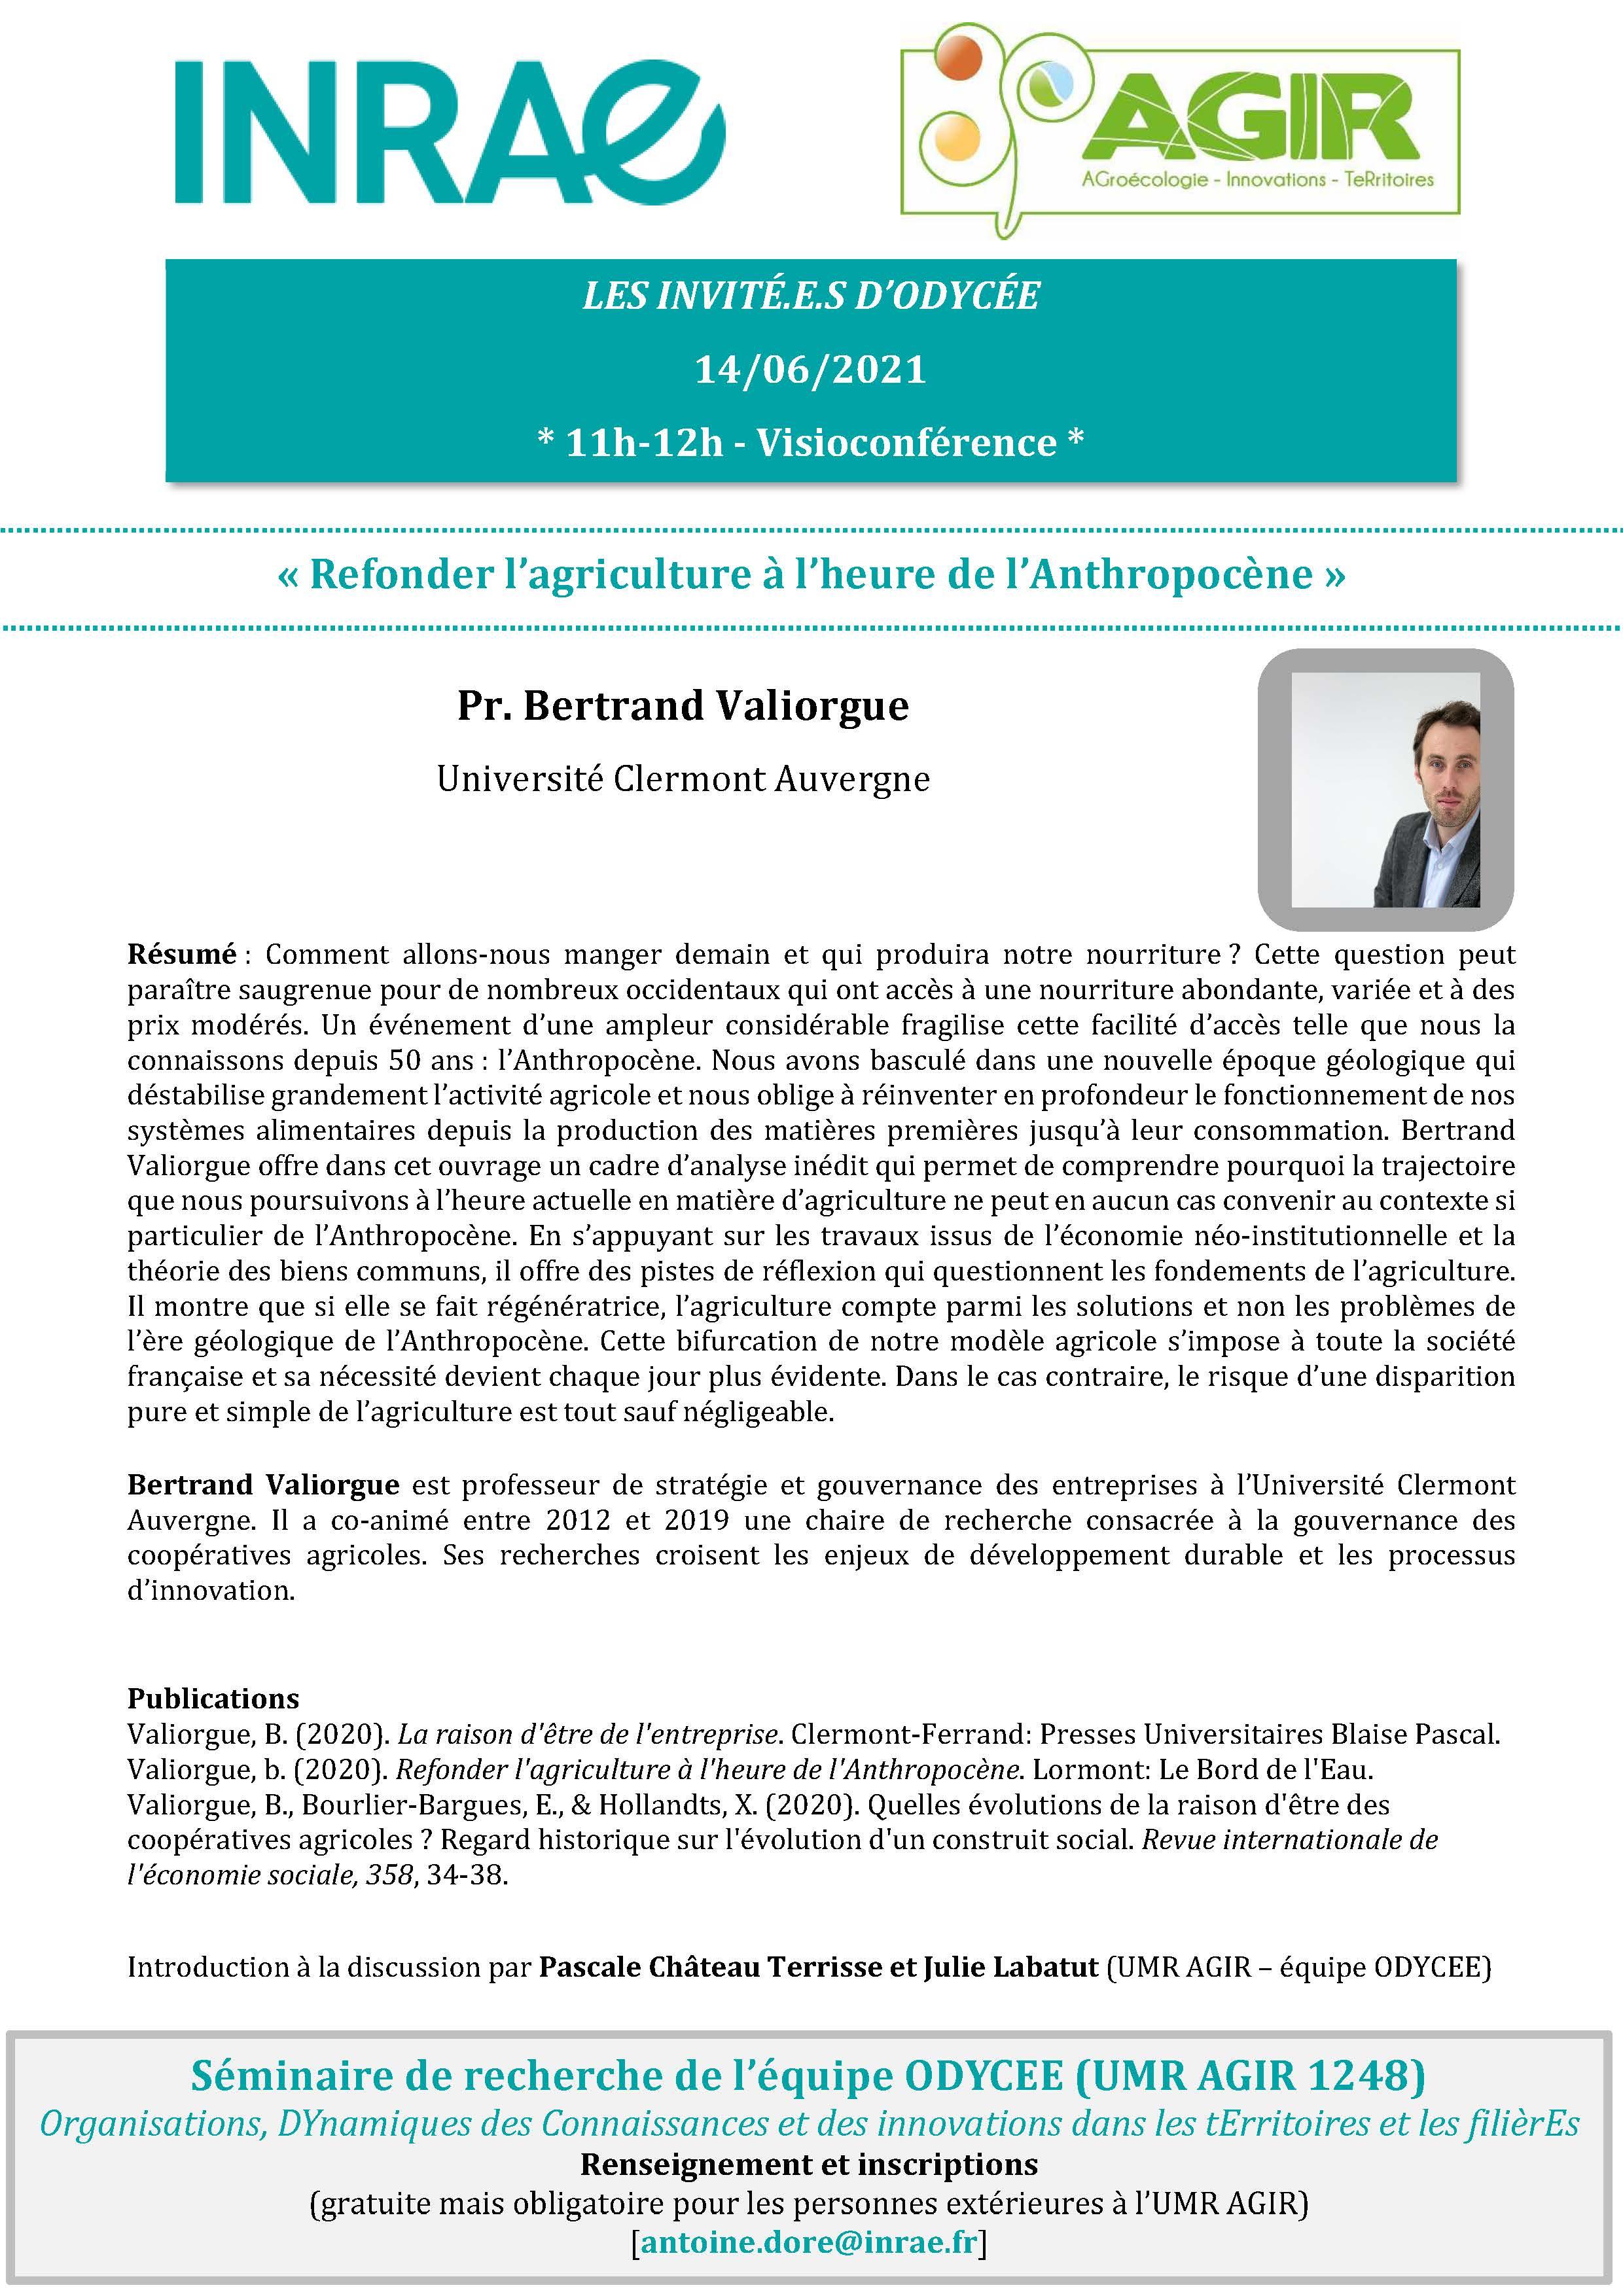 LesInvite.e.sODYCEE_20210614_Bertrand Valiorgue